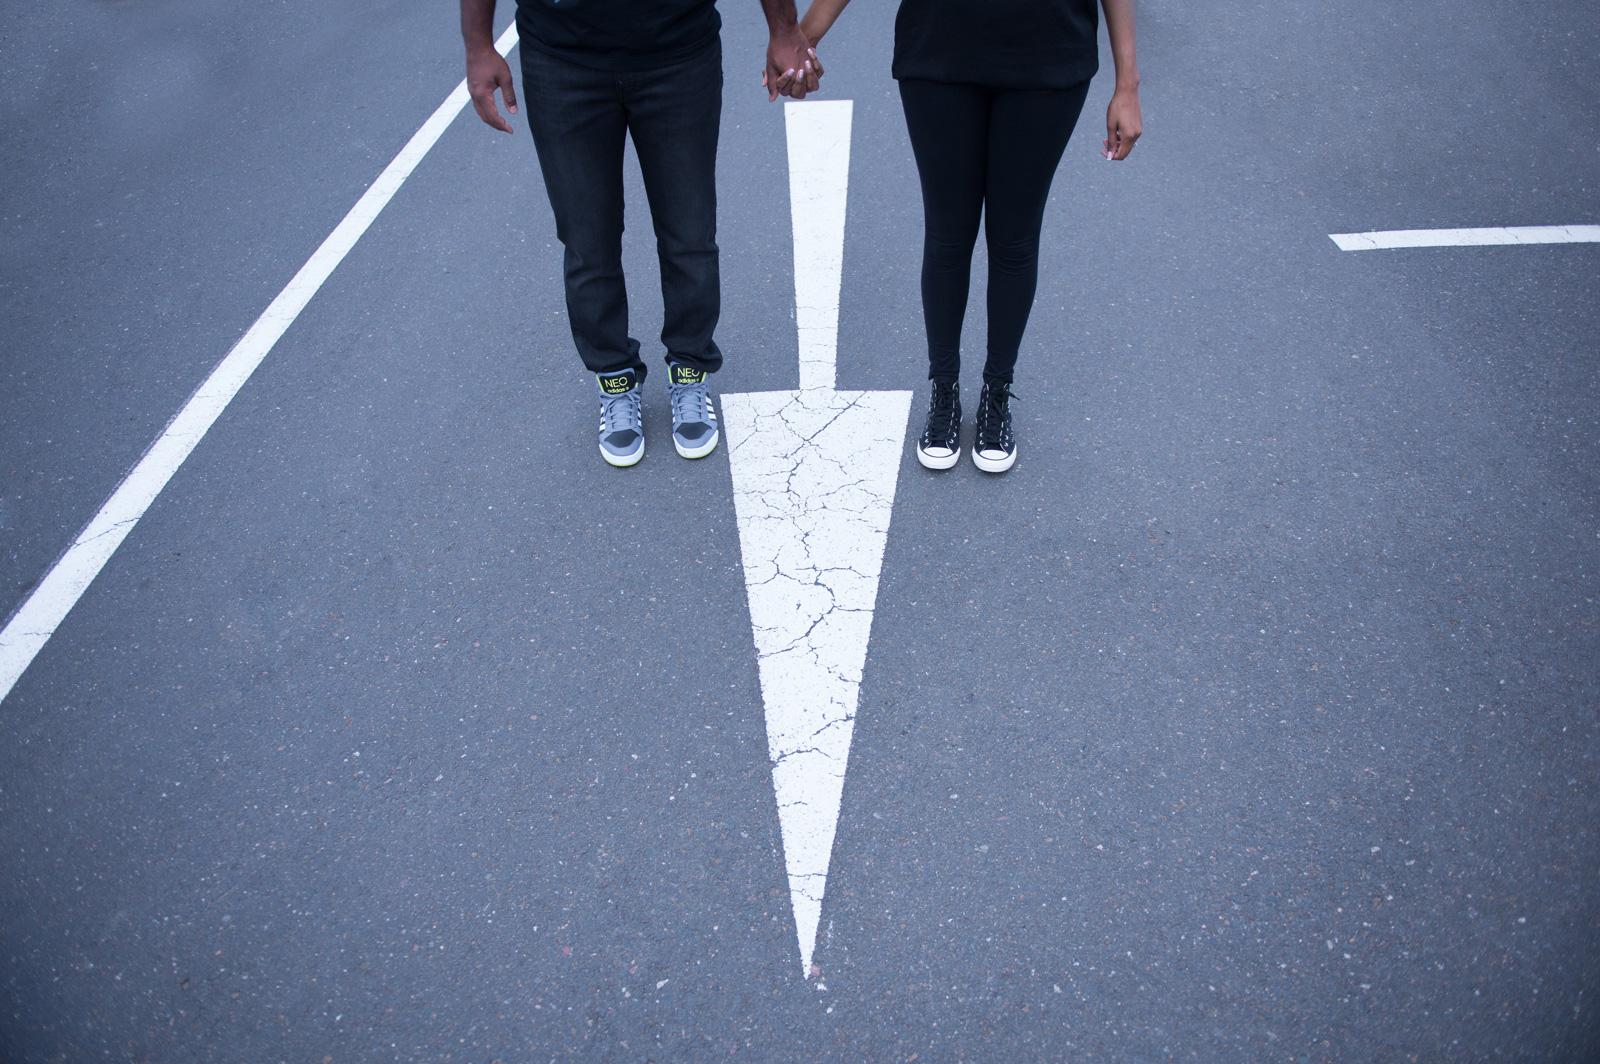 Feet with road arrow